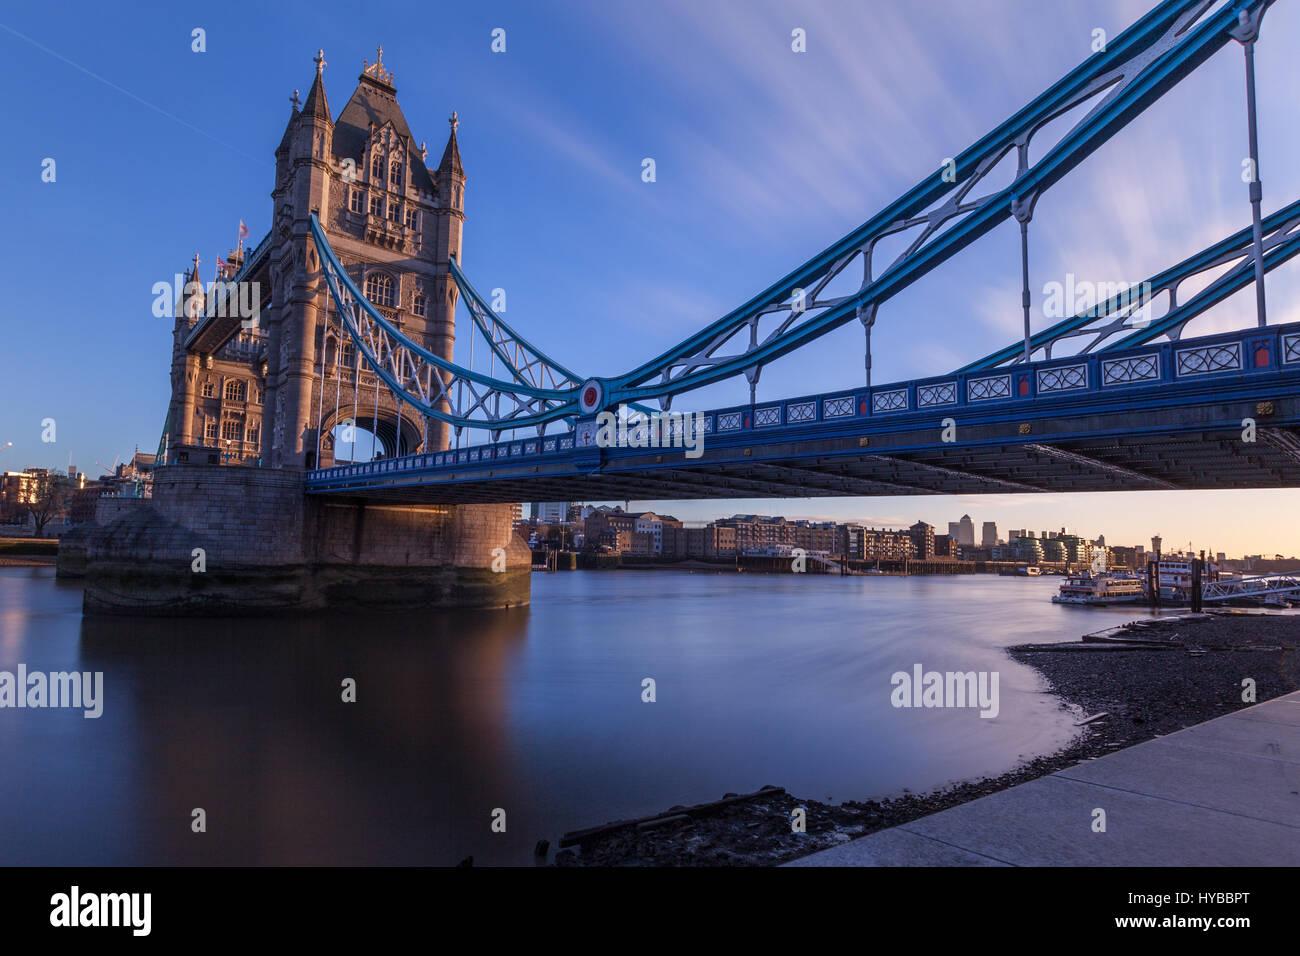 The Tower Bridge of London seen at sunrise. London, UK - Stock Image